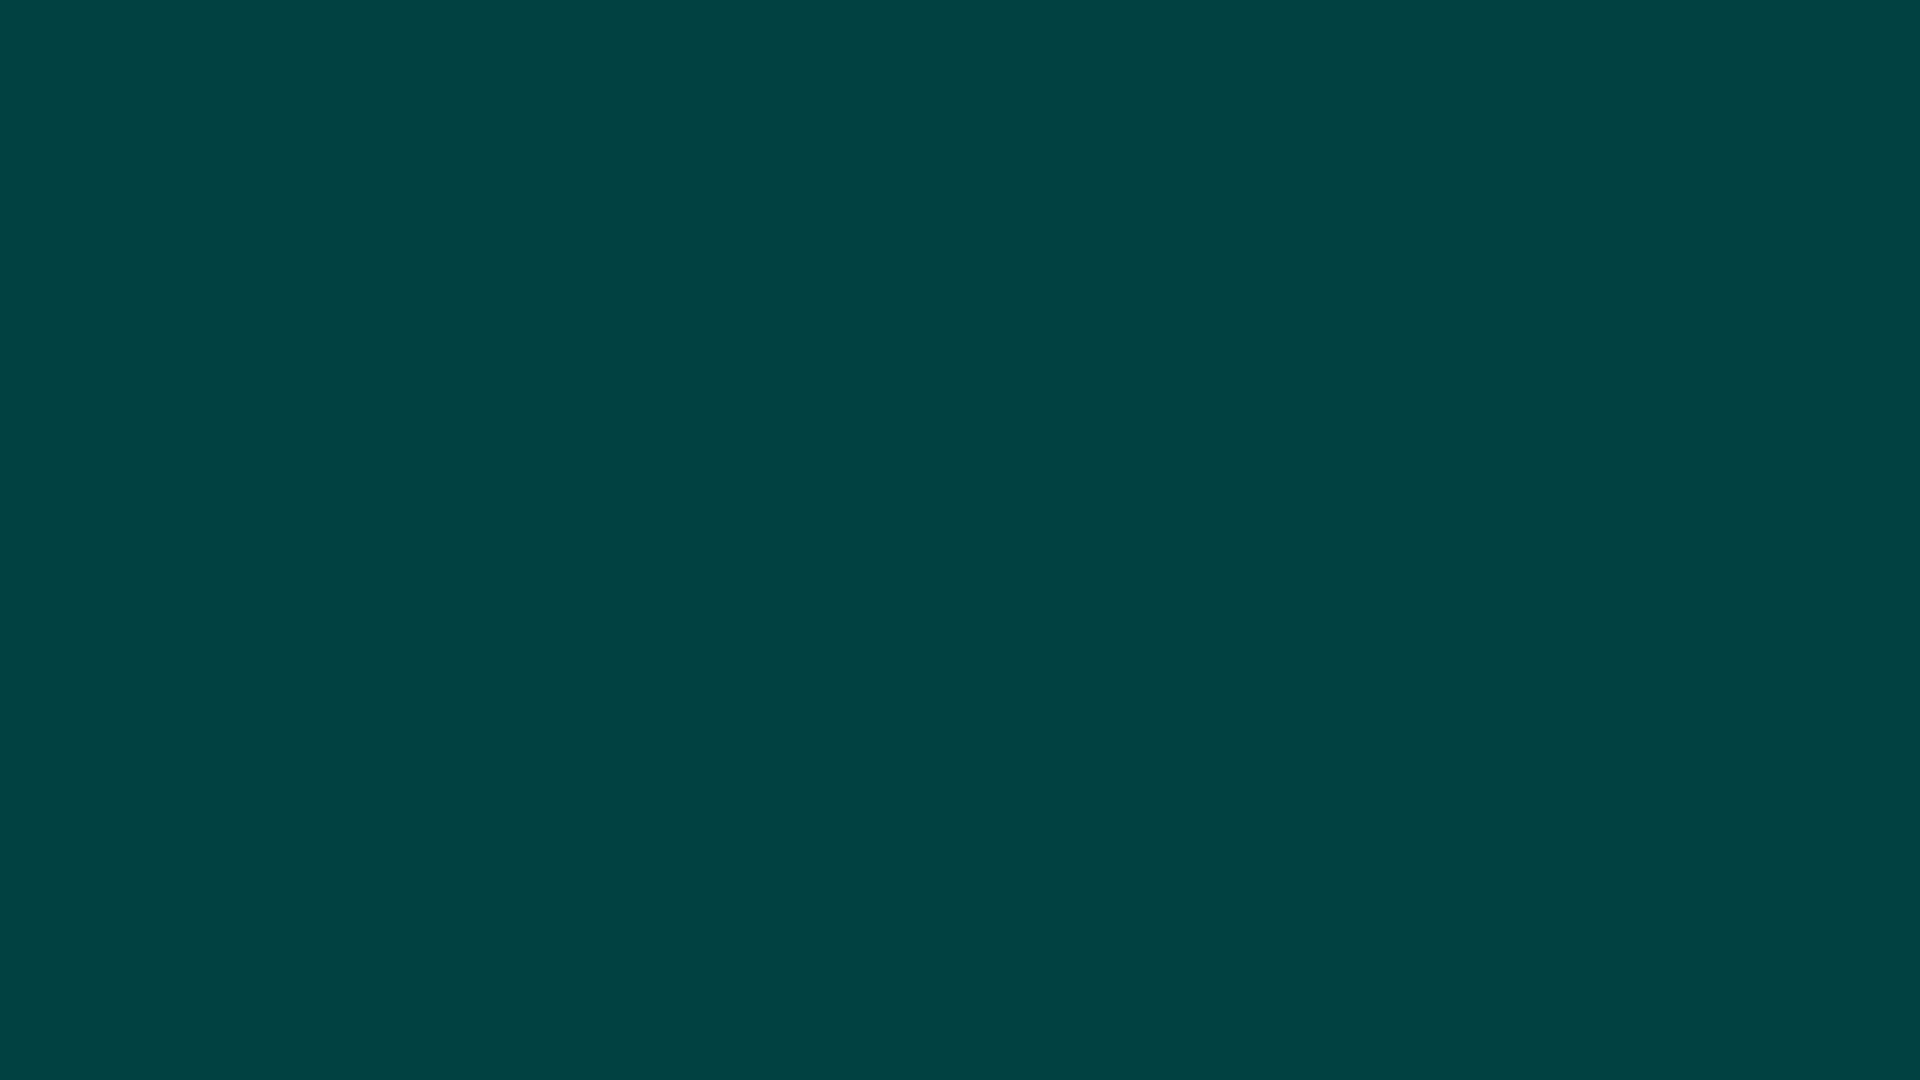 Solid Color wallpaper | | #57826